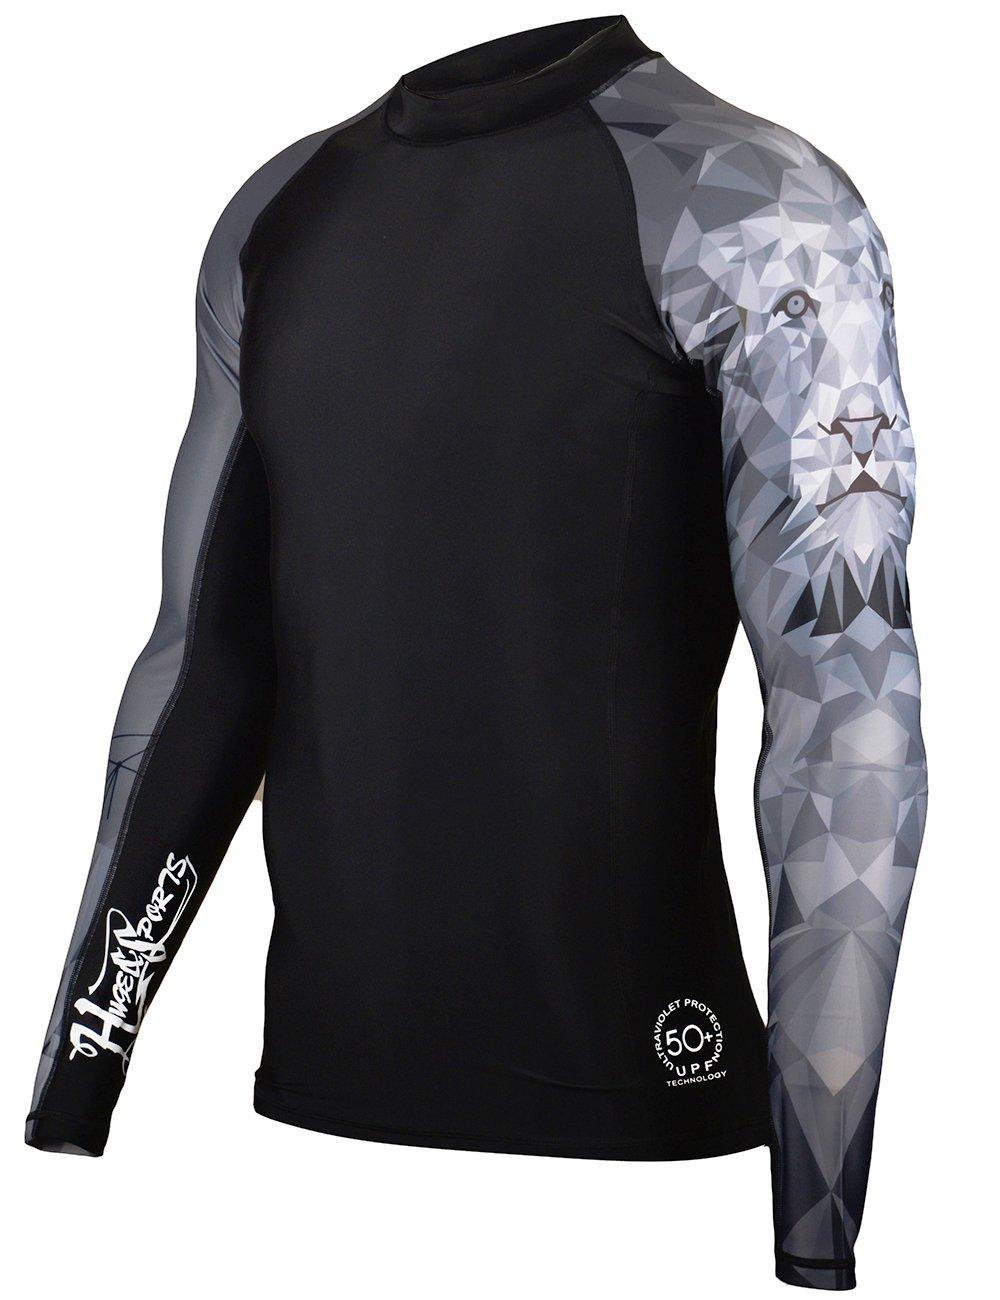 MADHERO Men's Splice UV Sun Protection Short/Long Sleeve Skins Rash Guard 6-RG3244